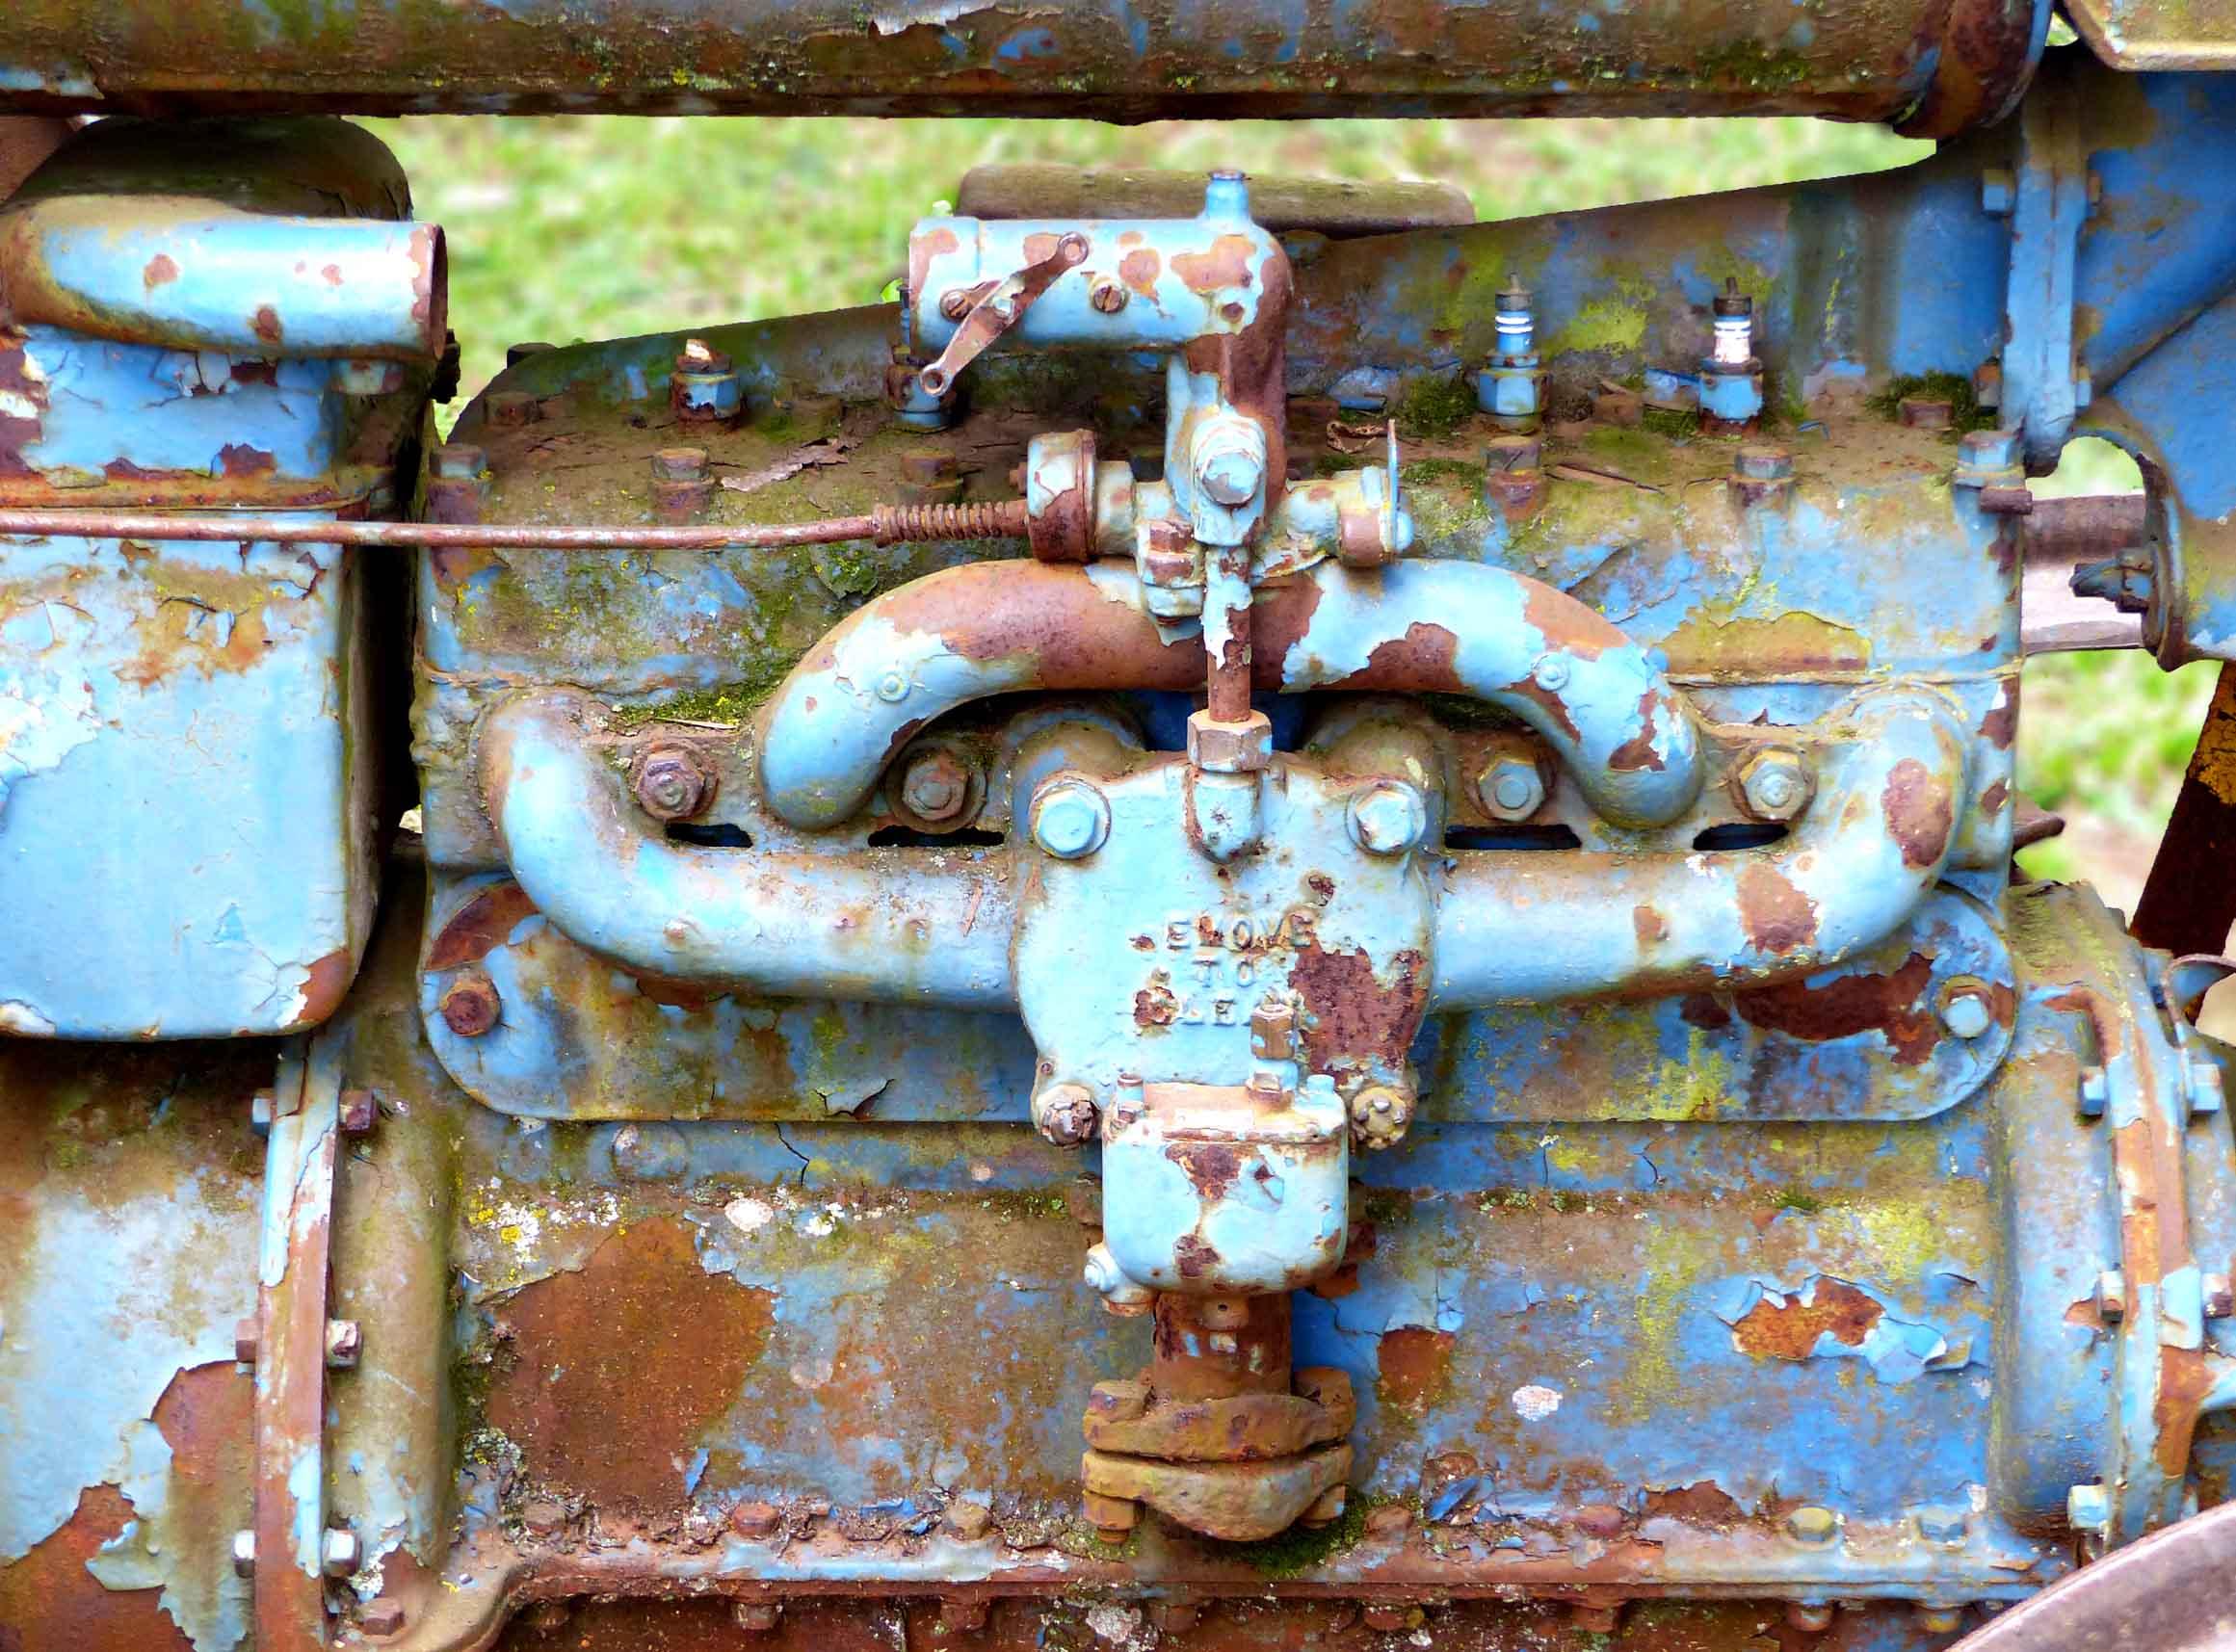 Peeling blue paint and rust